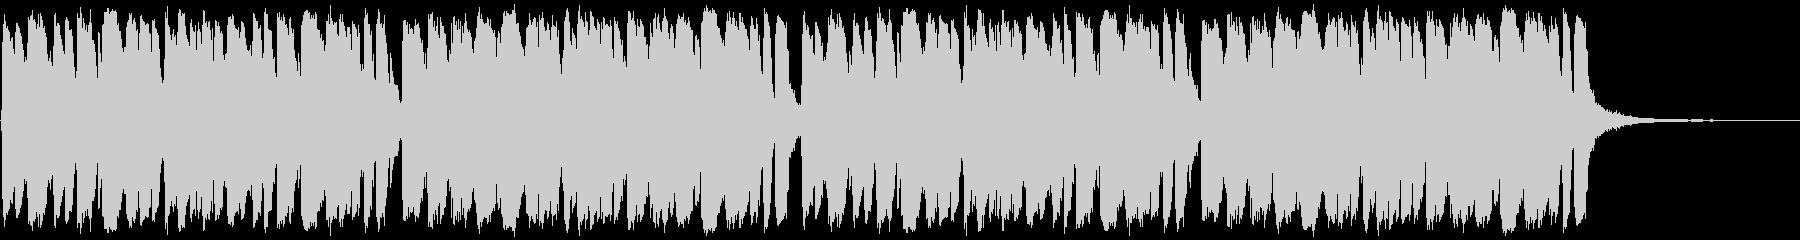 CM ホンキートンクピアノのカントリー2の未再生の波形